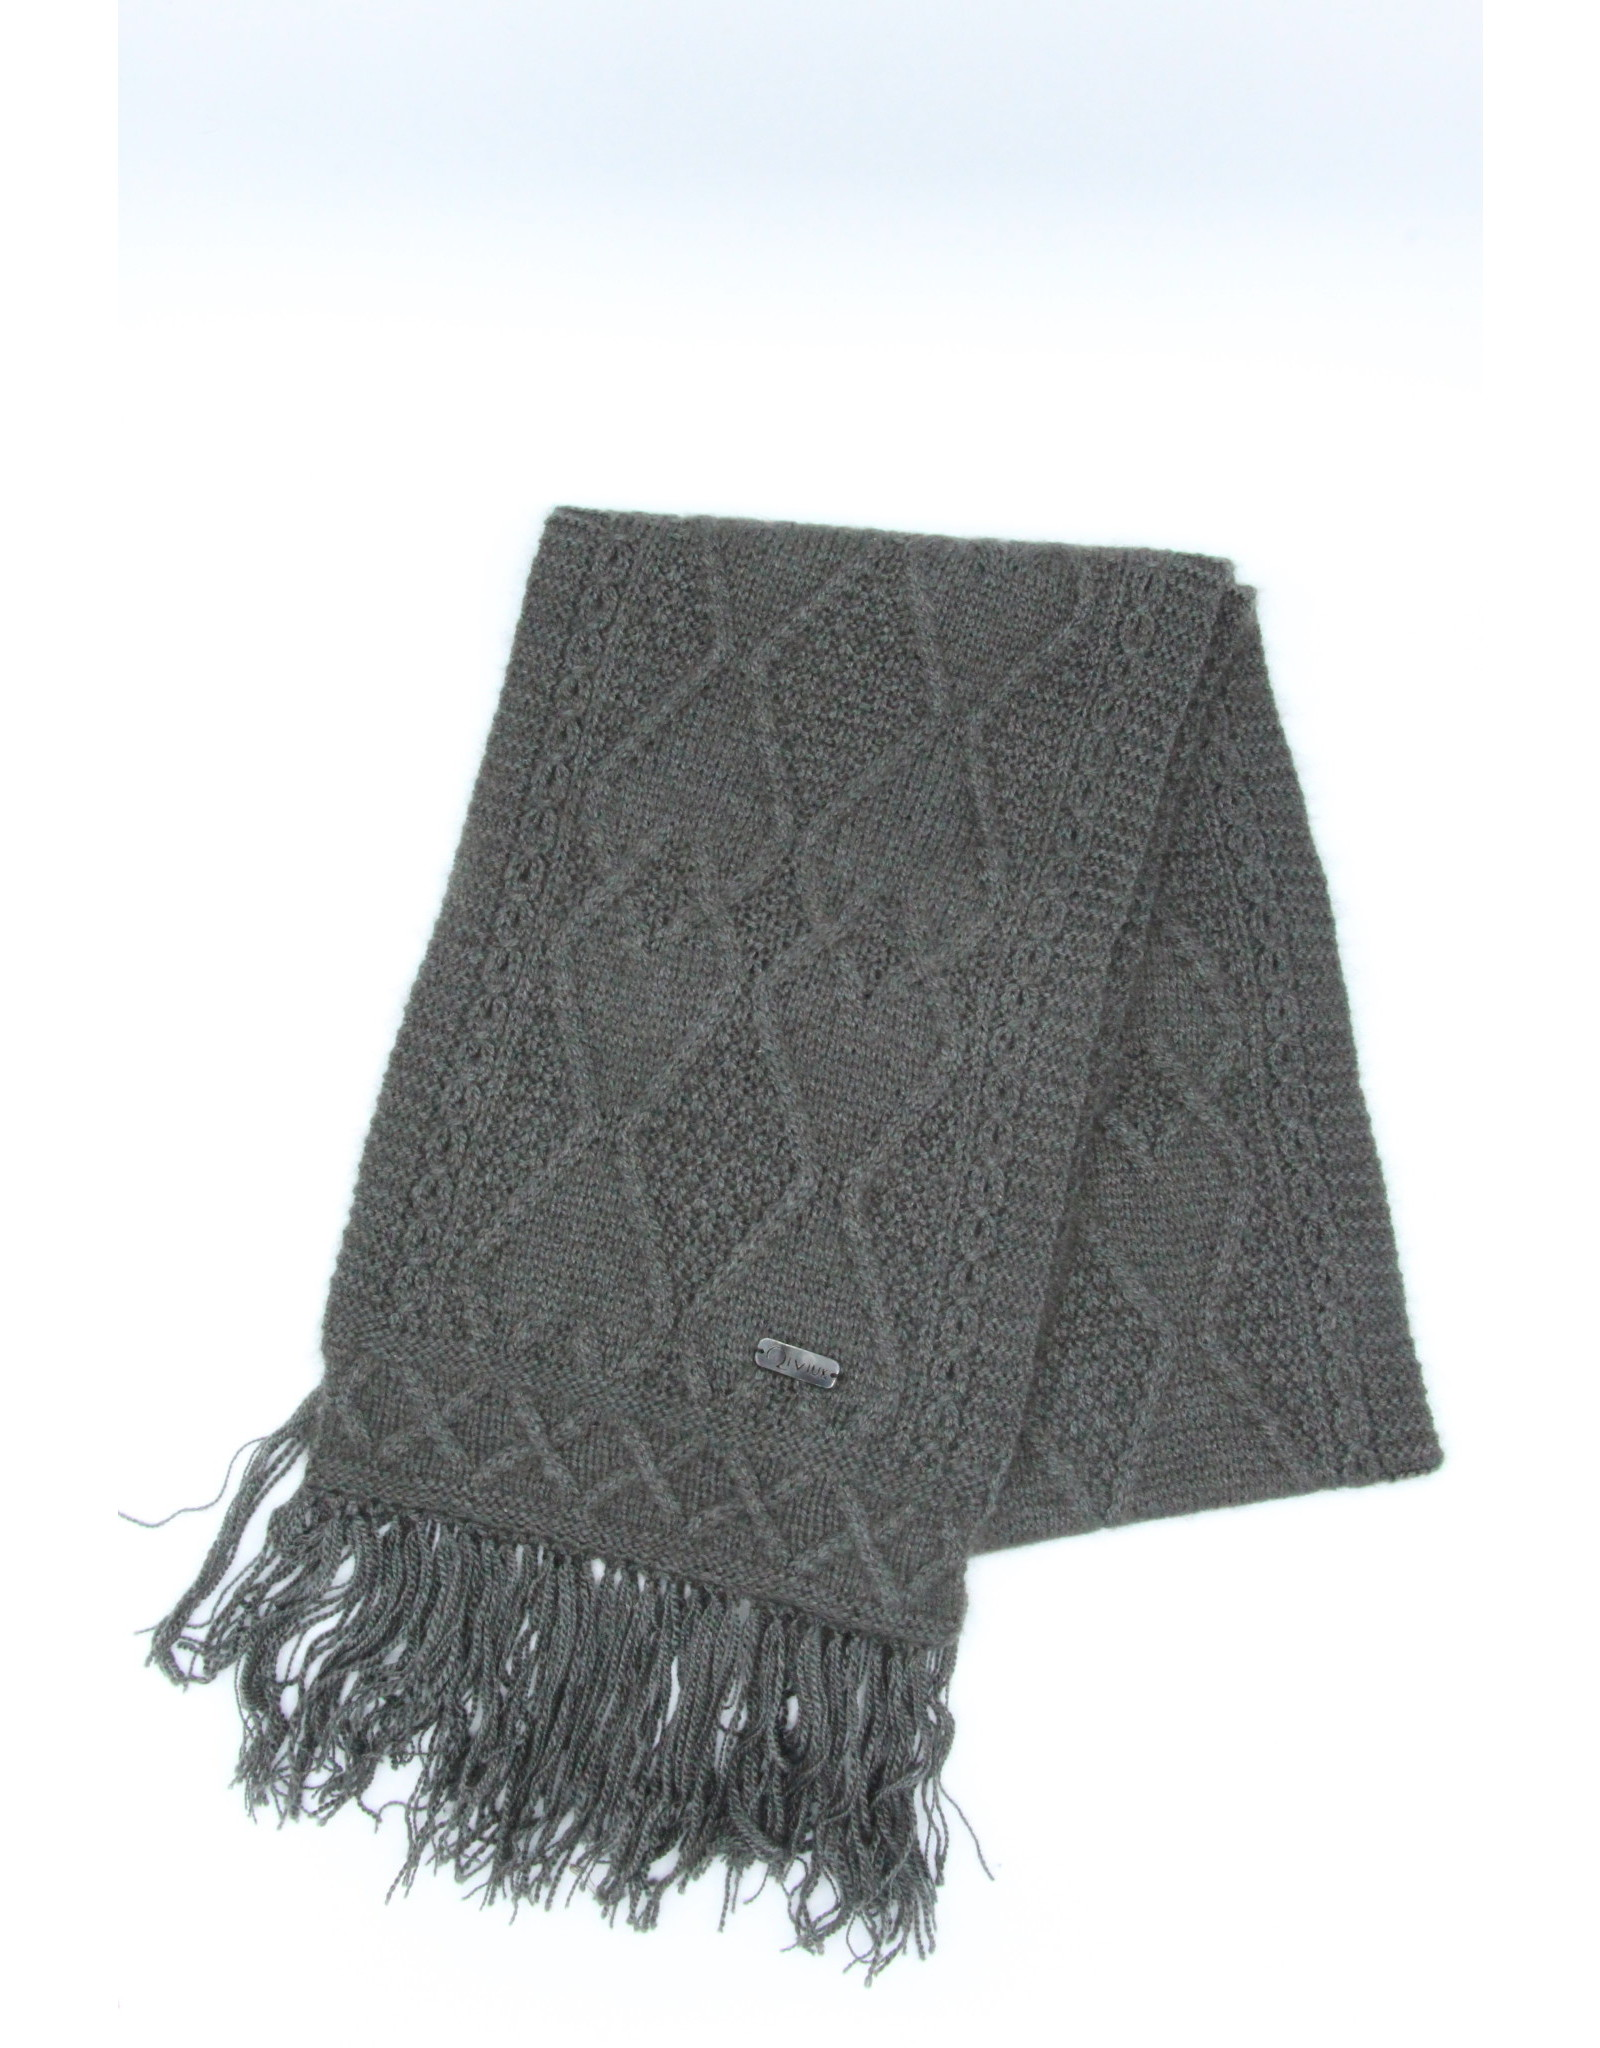 Mena Scarf - 45% Qiviuk 45% Merino 10% Silk